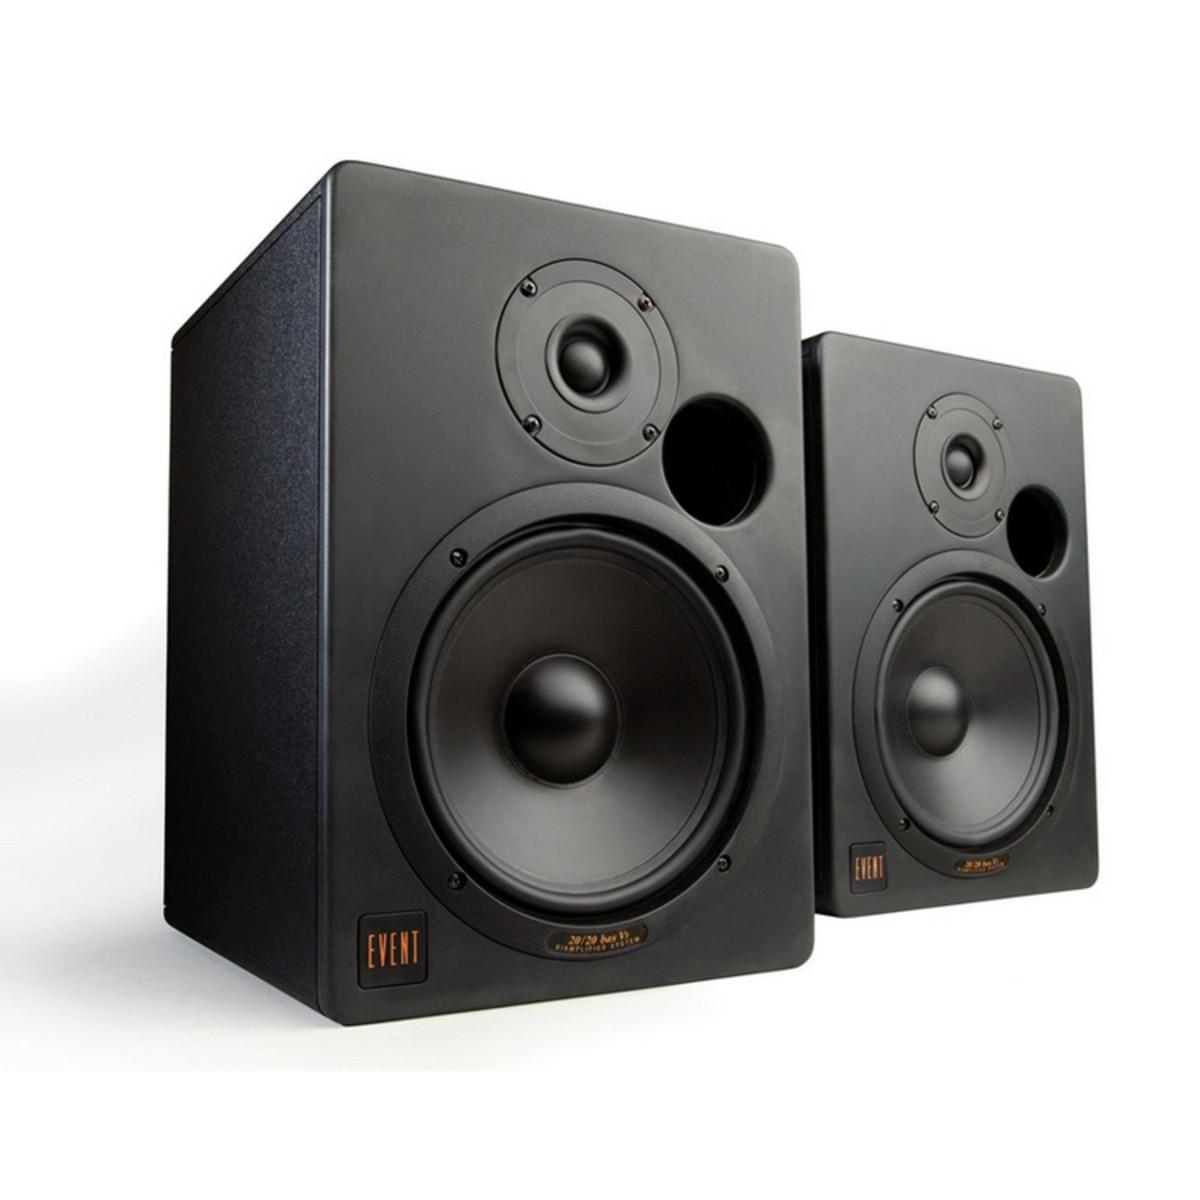 event 20 20 bas v3 active studio monitors pair ex demo at gear4music. Black Bedroom Furniture Sets. Home Design Ideas